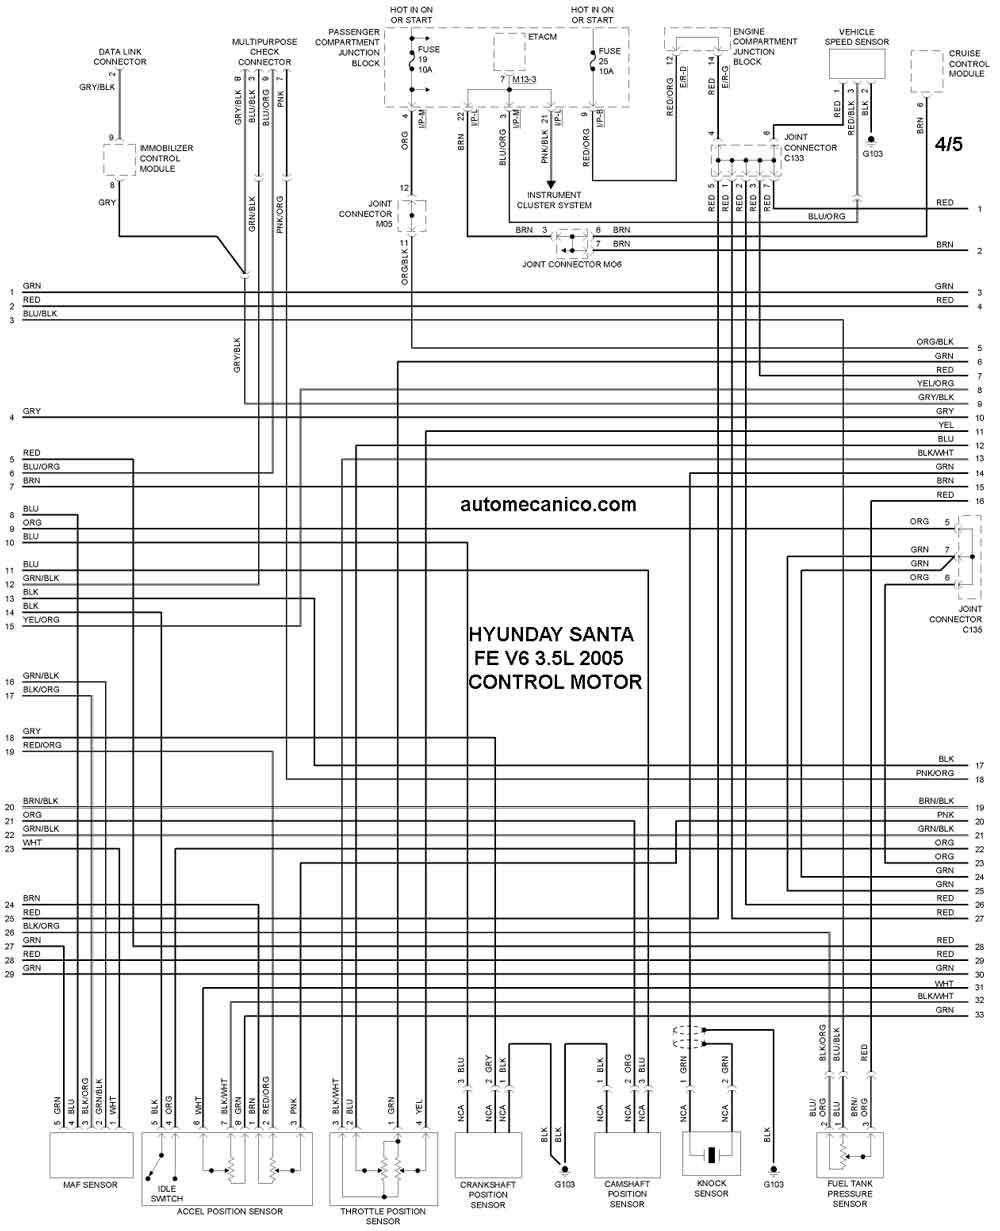 2003 hyundai santa fe Diagrama del motor